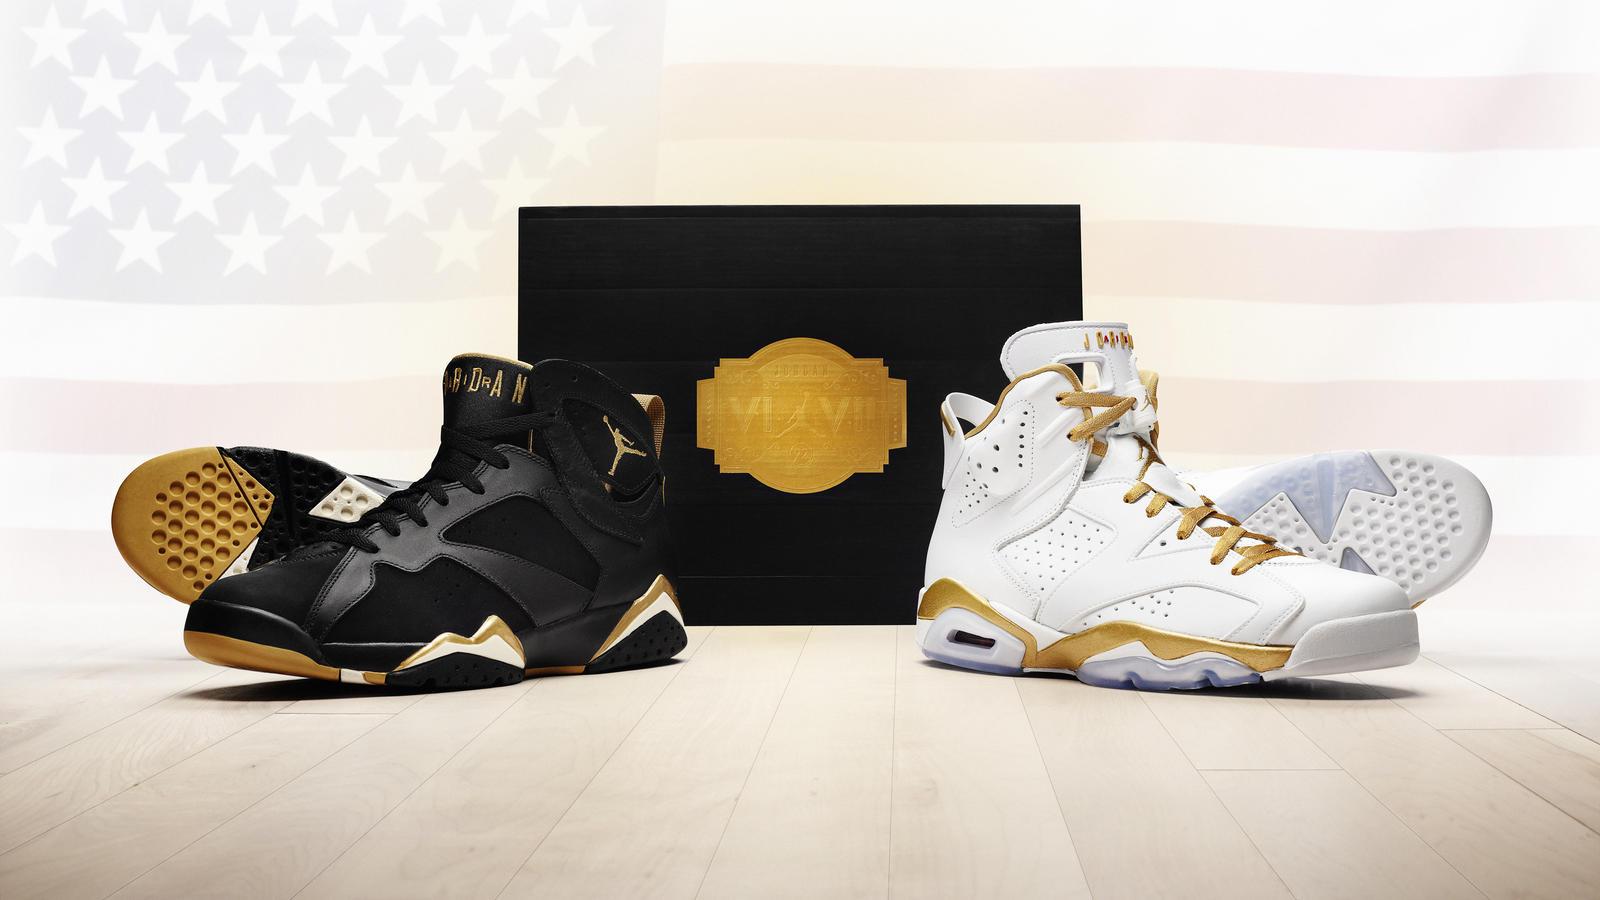 Golden Moments' pack releasing